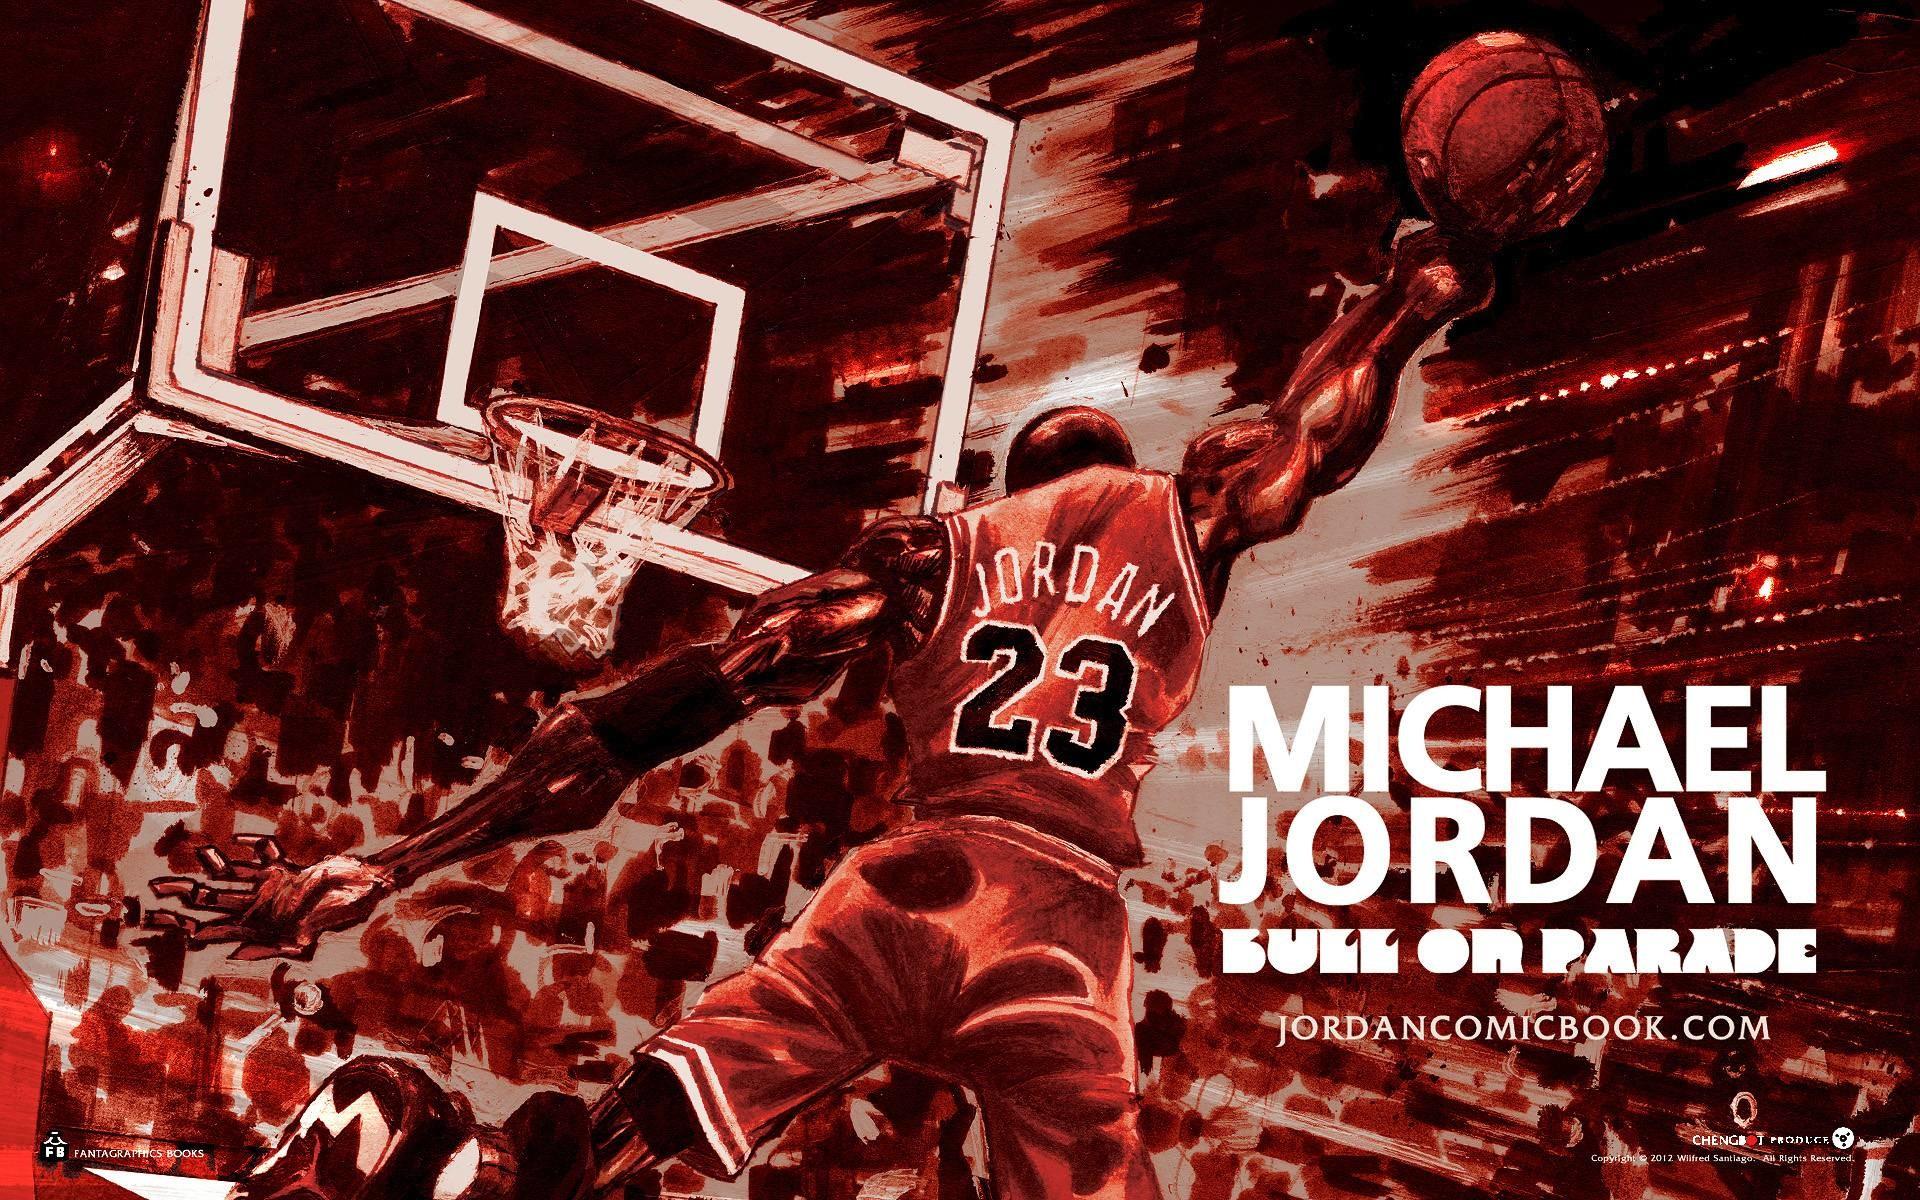 1920x1200 Download Michael Jordan Wallpaper Hd Background 9 Hd Wallpapers